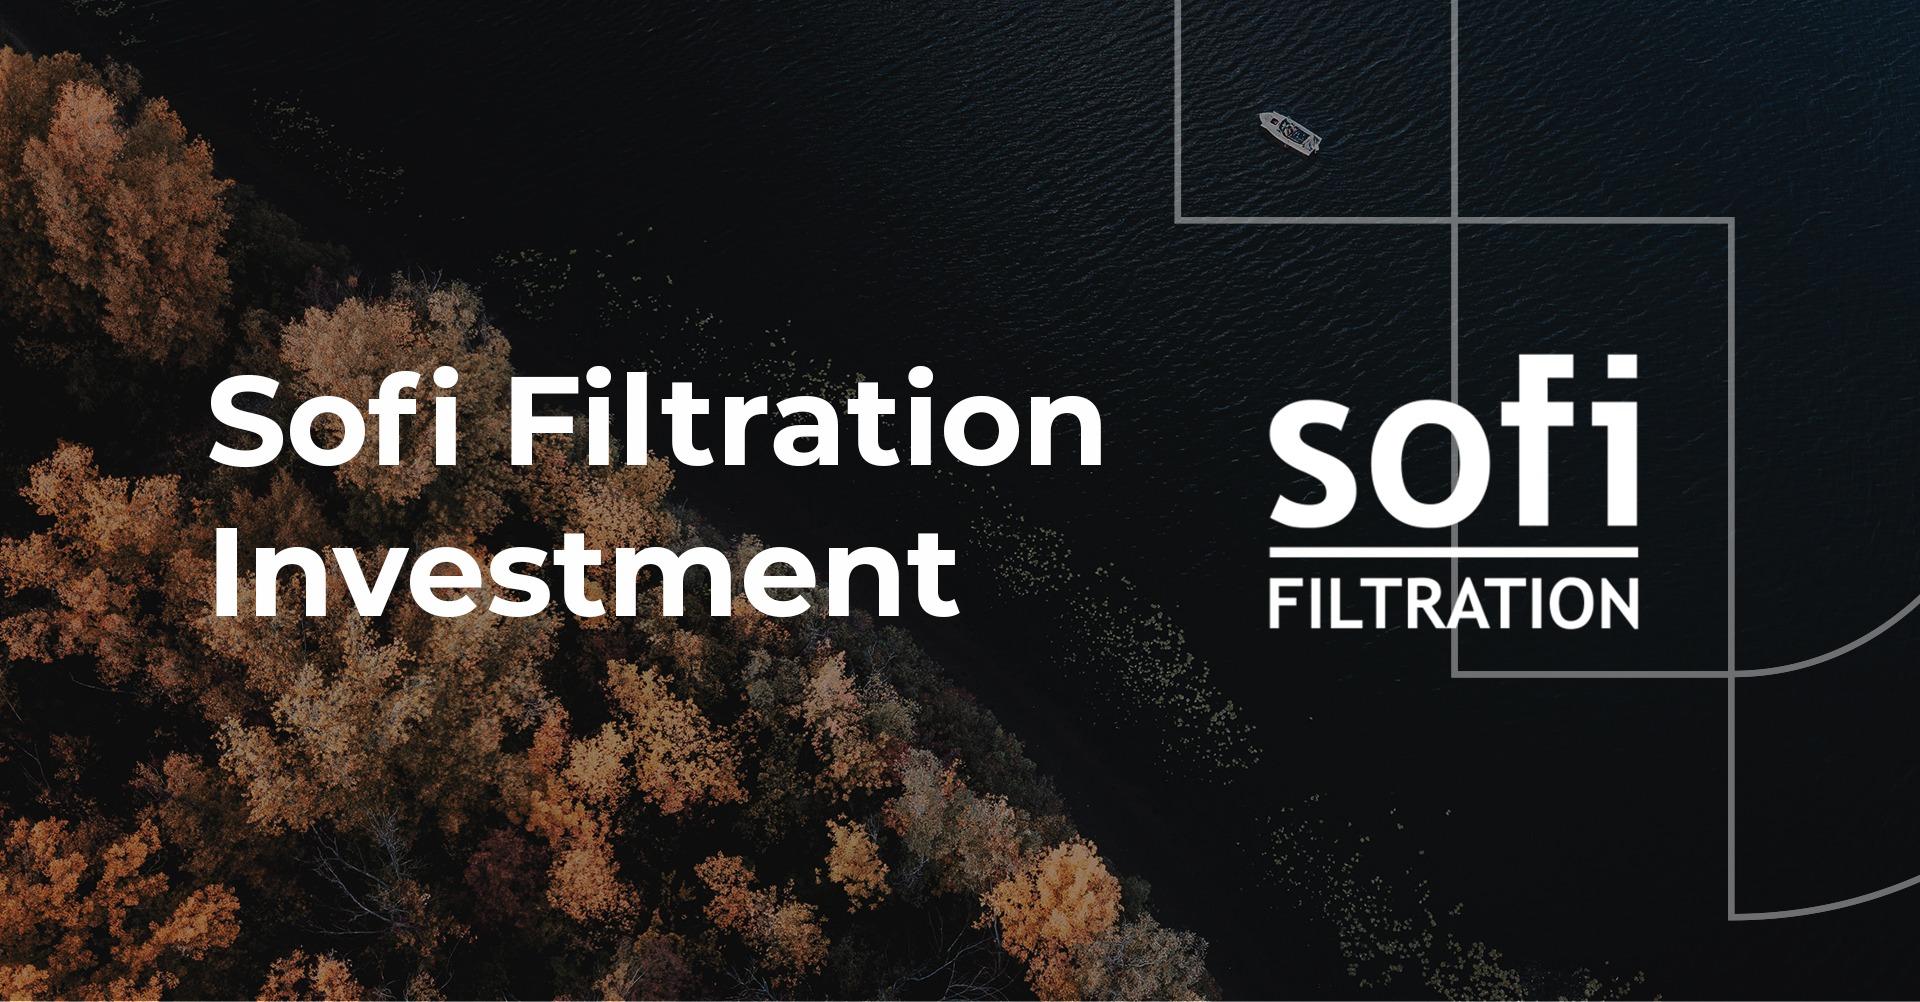 Sofi Filtration announcement thumbnail